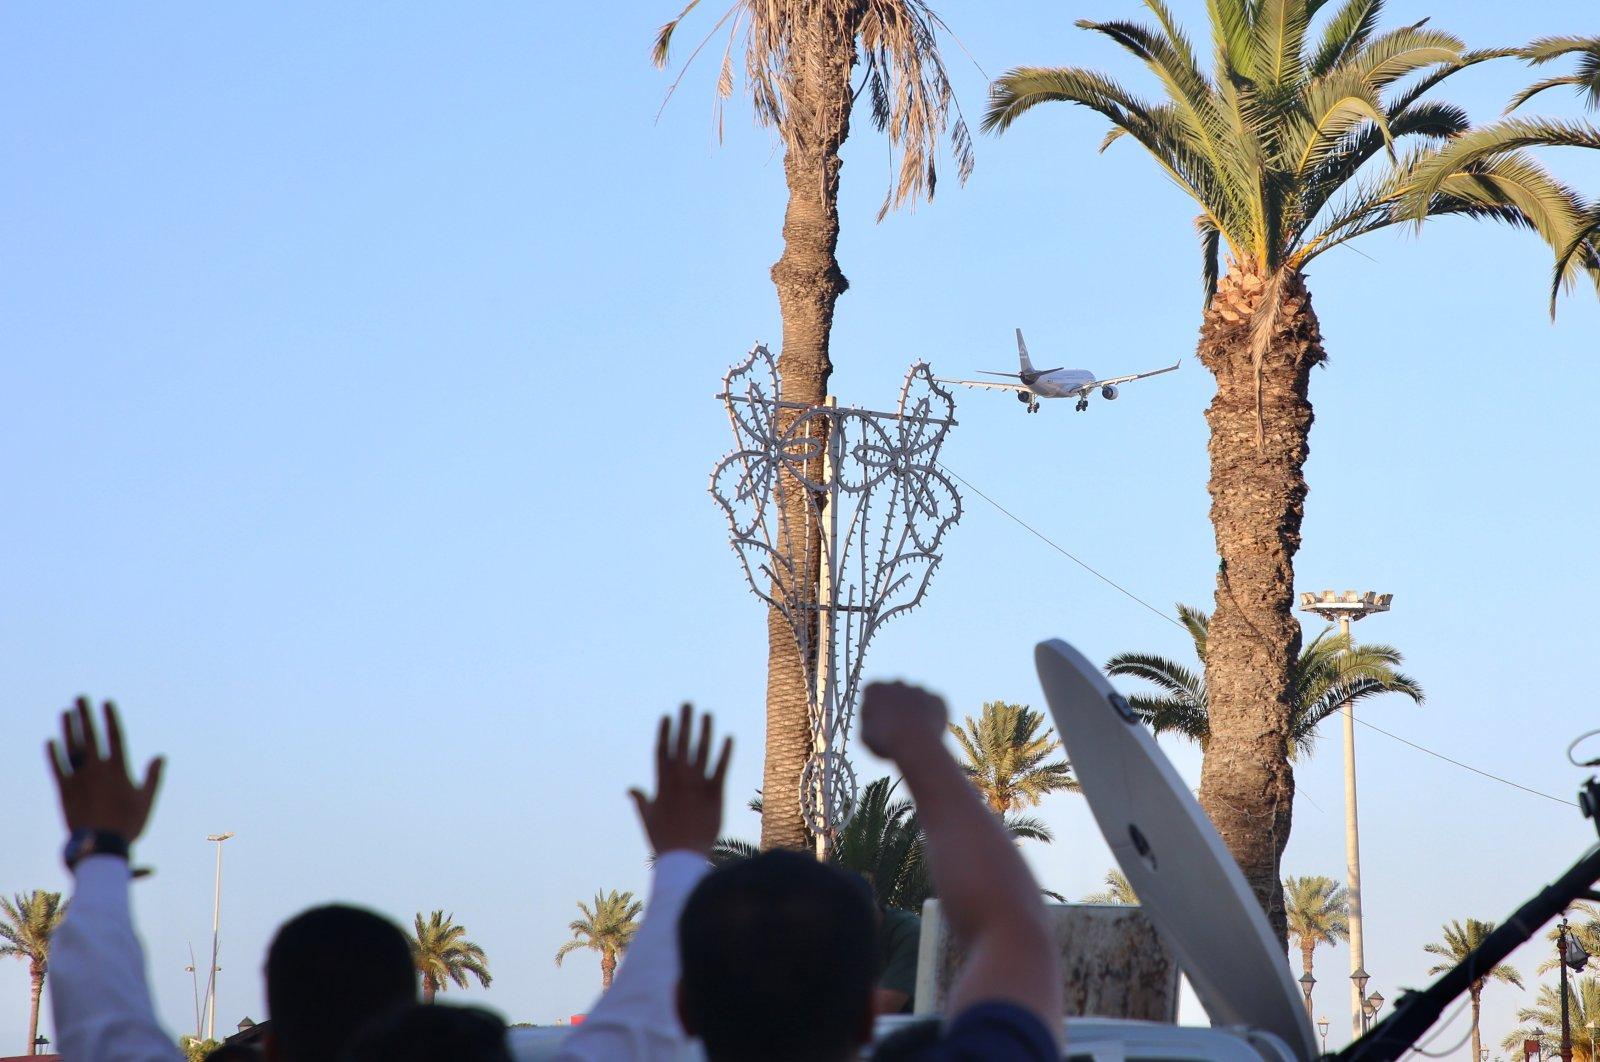 Libyan people in the capital's Martyr's Square celebrate the retaking of Tarhouna and Bani Walid provinces from warlord Khalifa Haftar, Tripoli, Libya, June 5, 2020 (AA Photo)